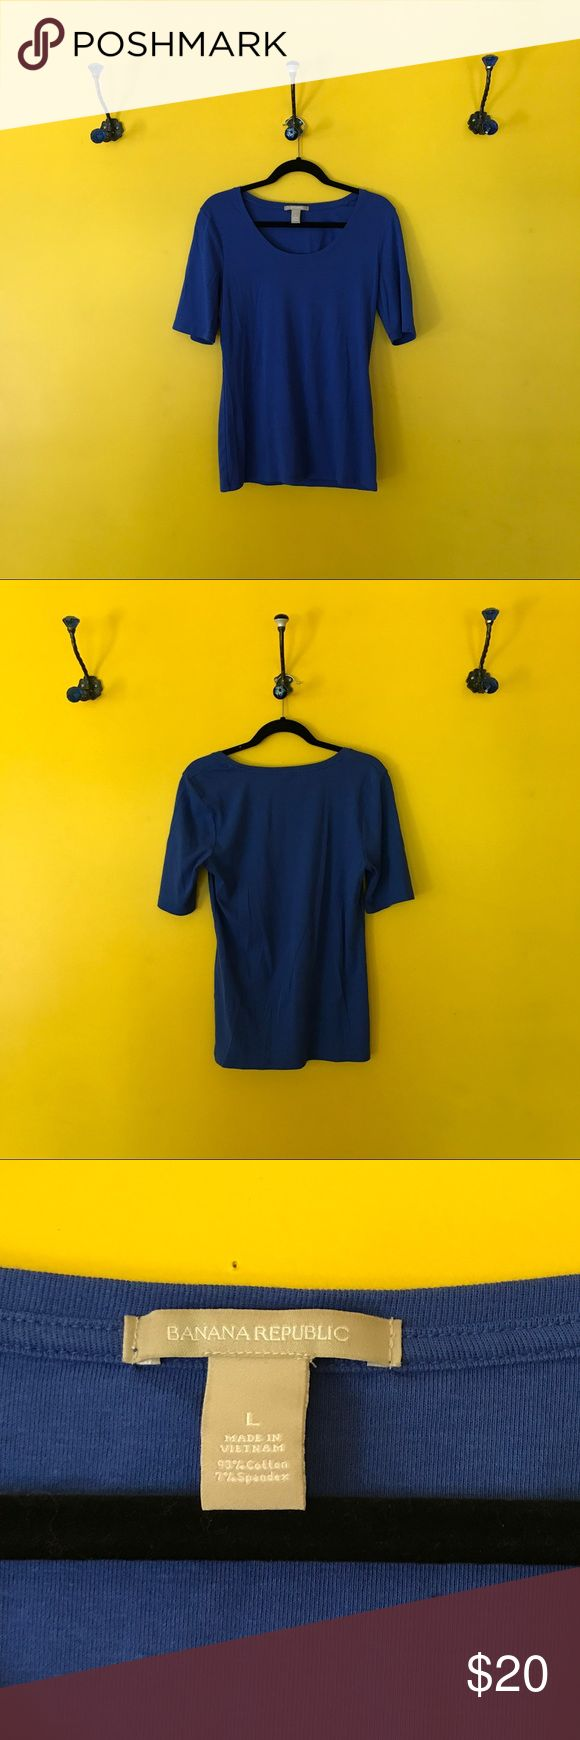 Banana Republic Cobalt Blue Top Banana Republic Cobalt Blue Top.  Rich cobalt blue soft tee.  Longer sleeves round neck.  Great pop of color! Banana Republic Tops Tees - Short Sleeve